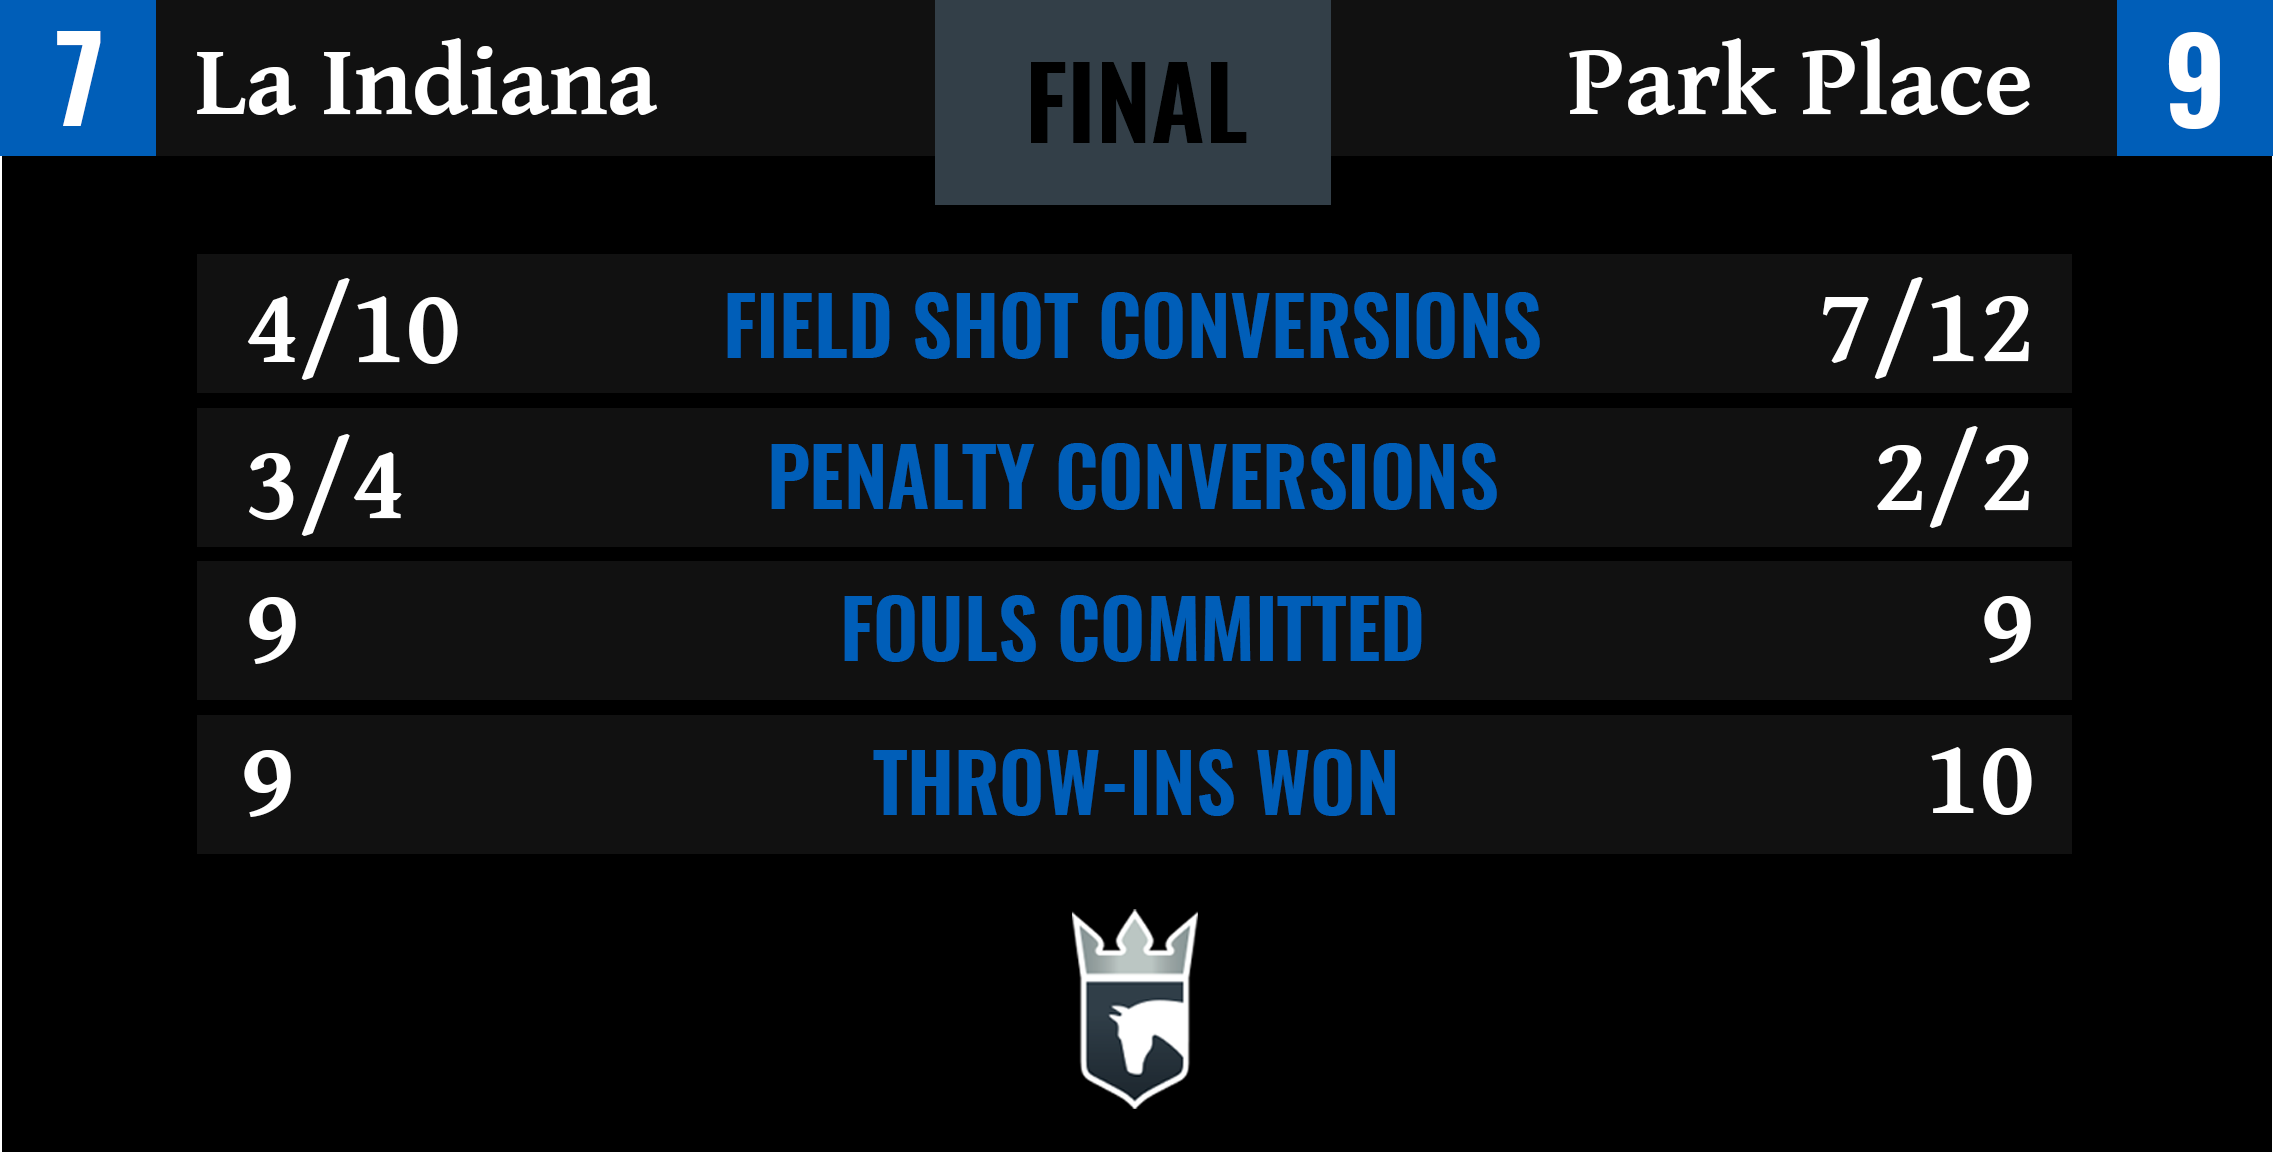 La Indiana vs Park Place Final Stats